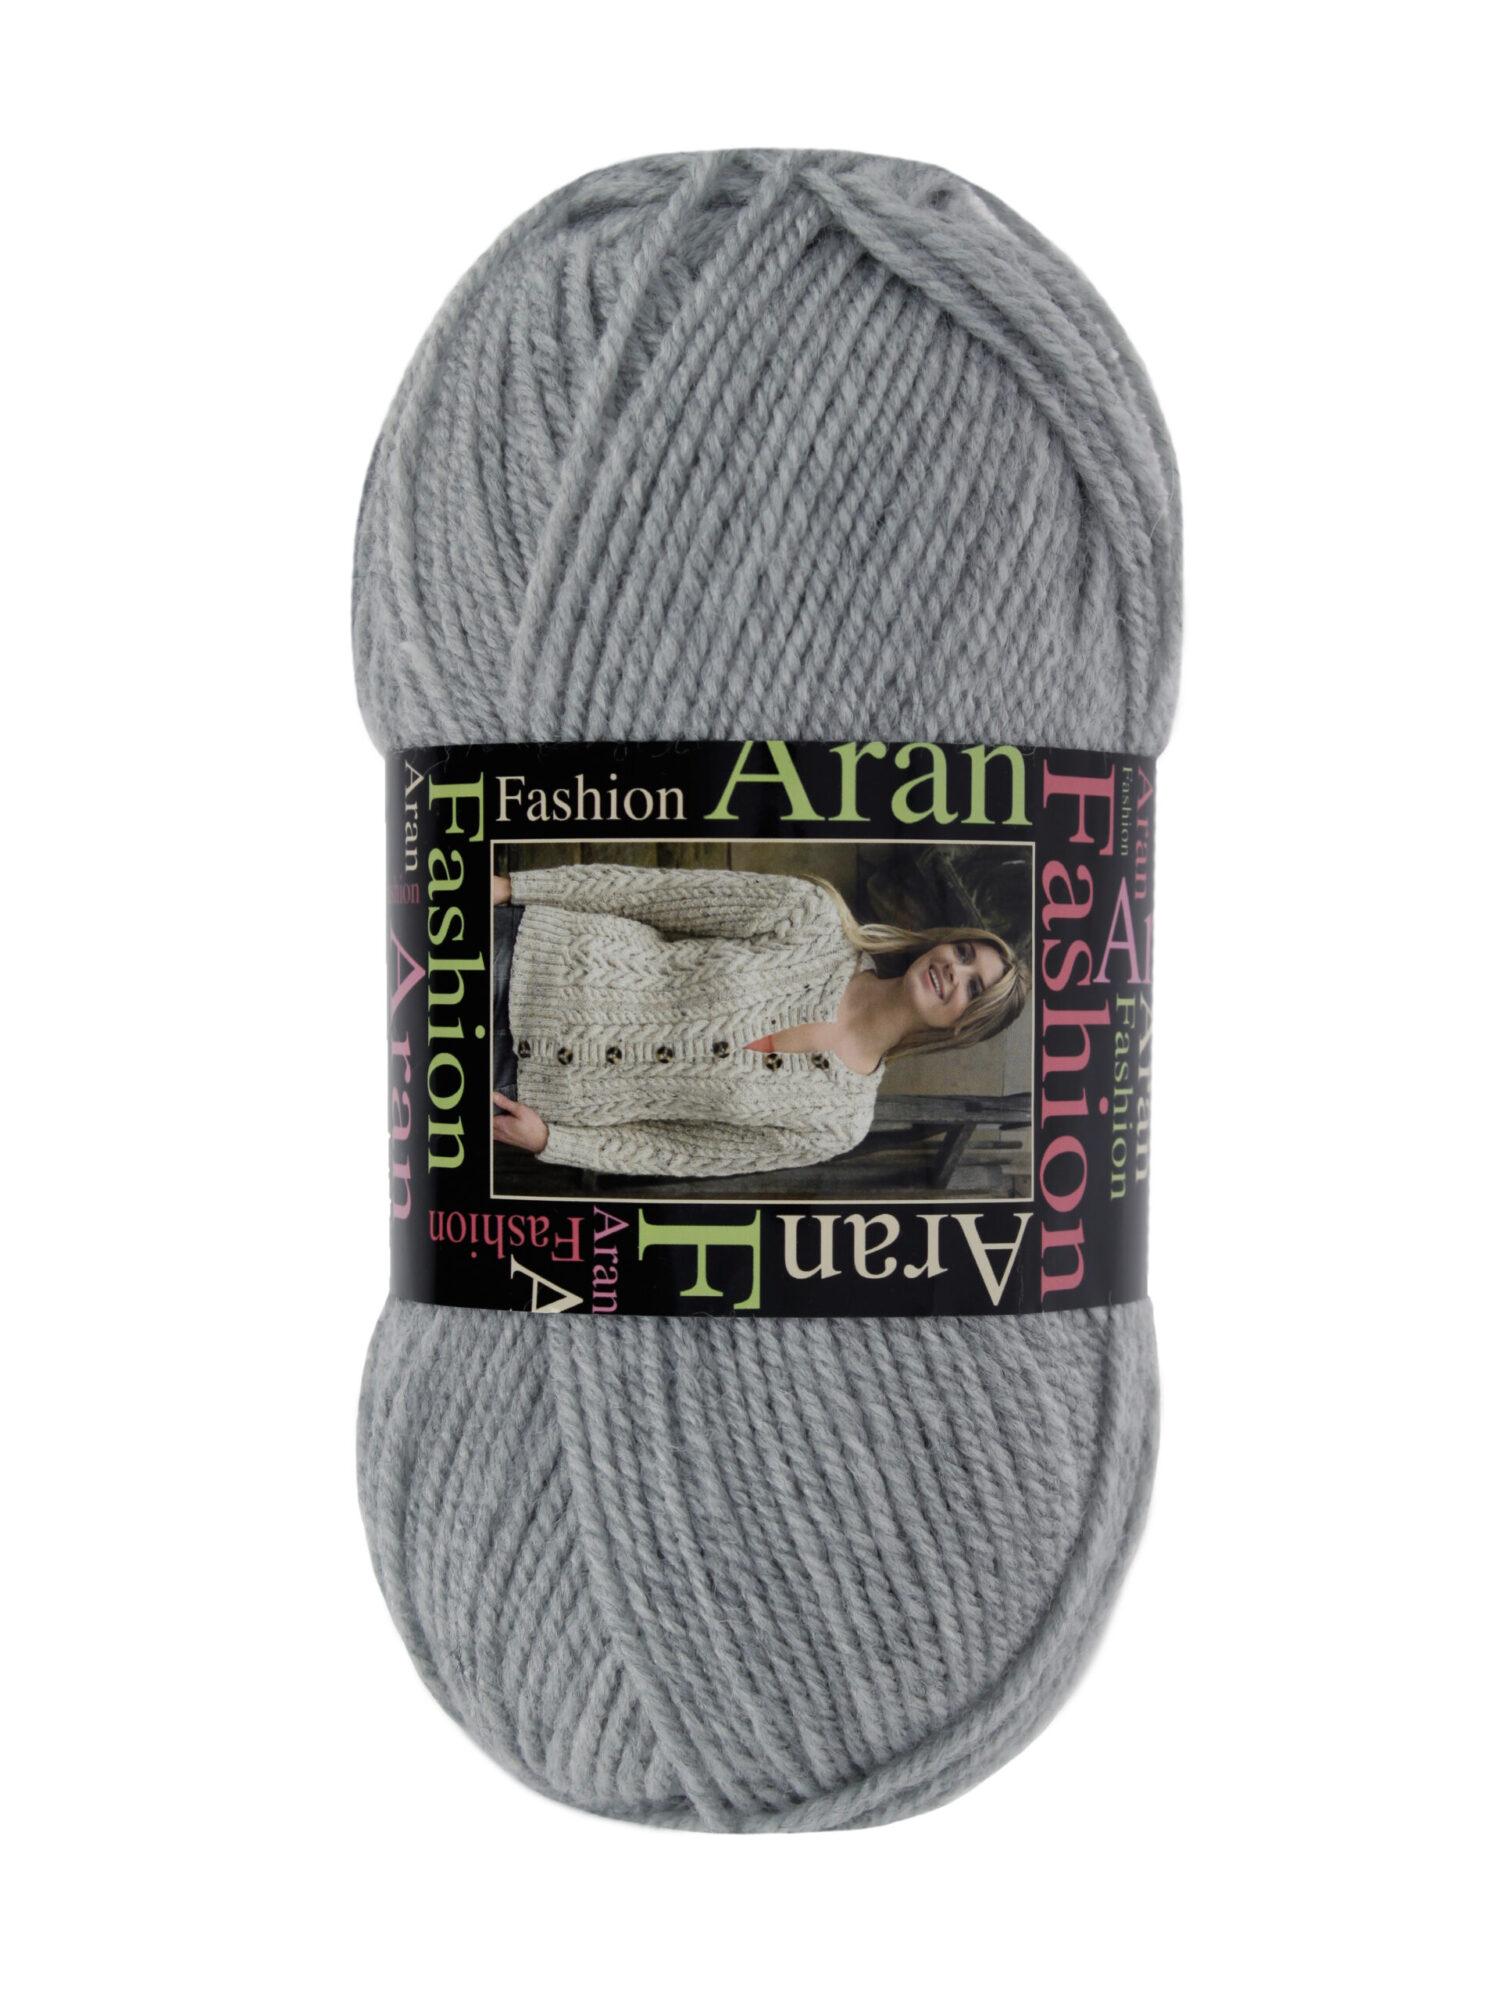 King Cole Fashion Aran product image